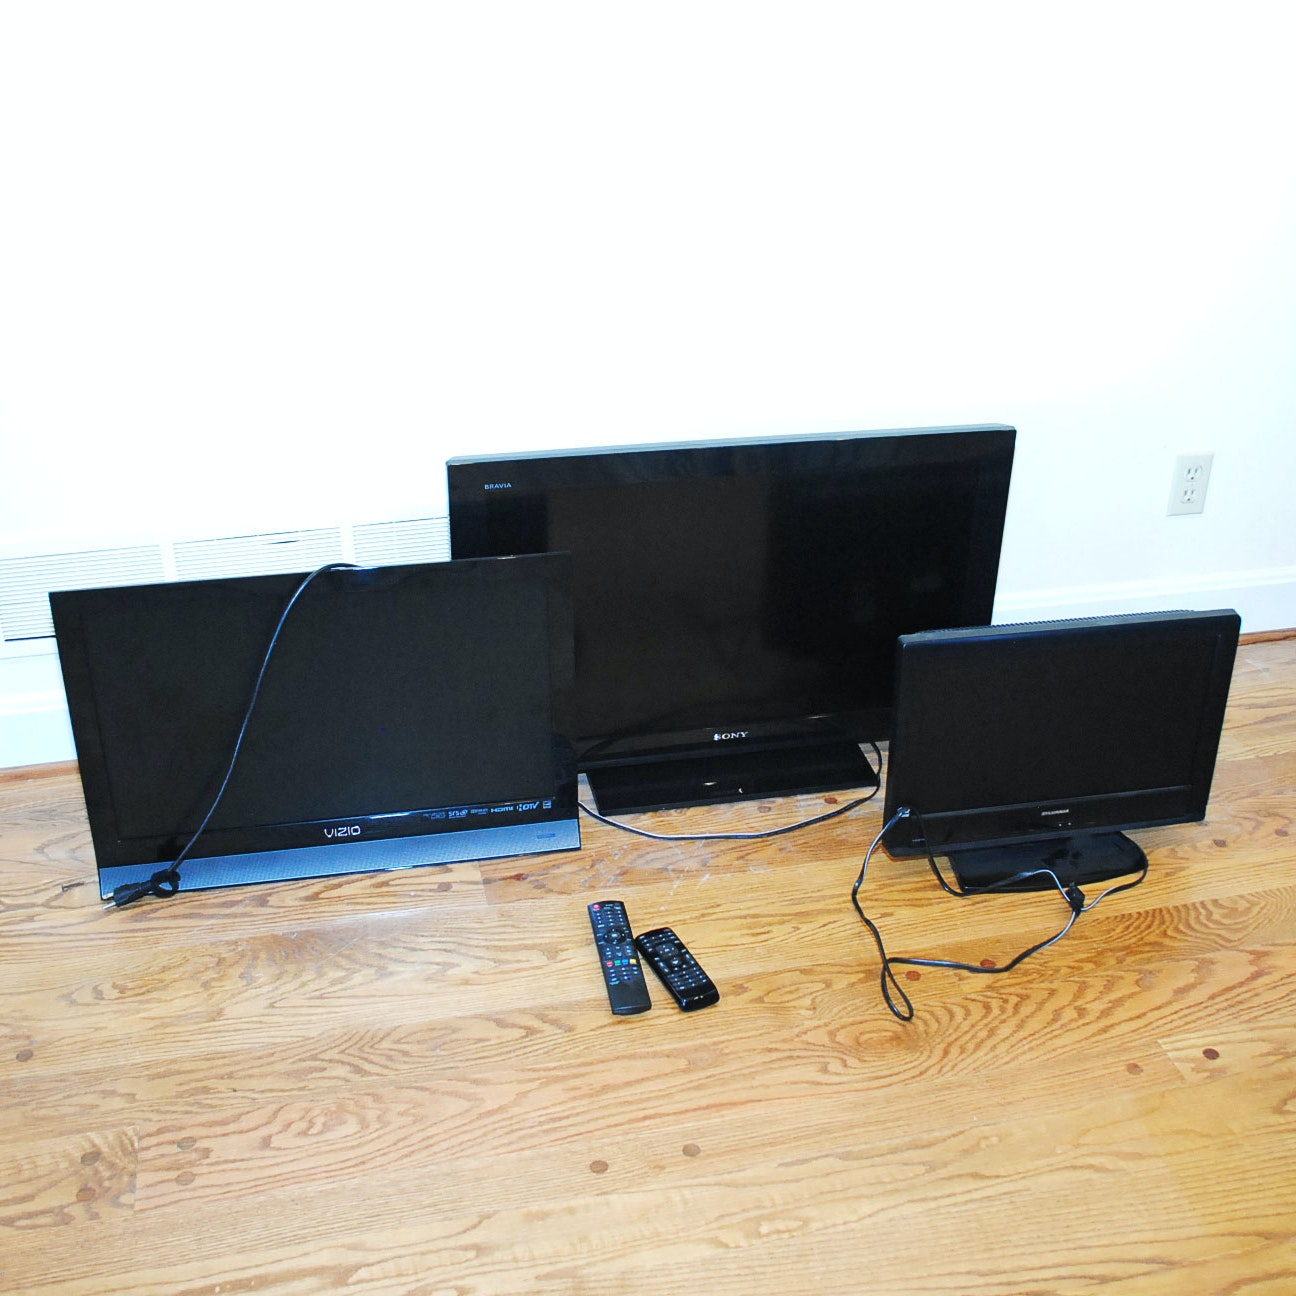 Vizio, Sylvania and Sony Flat Screen Televisions